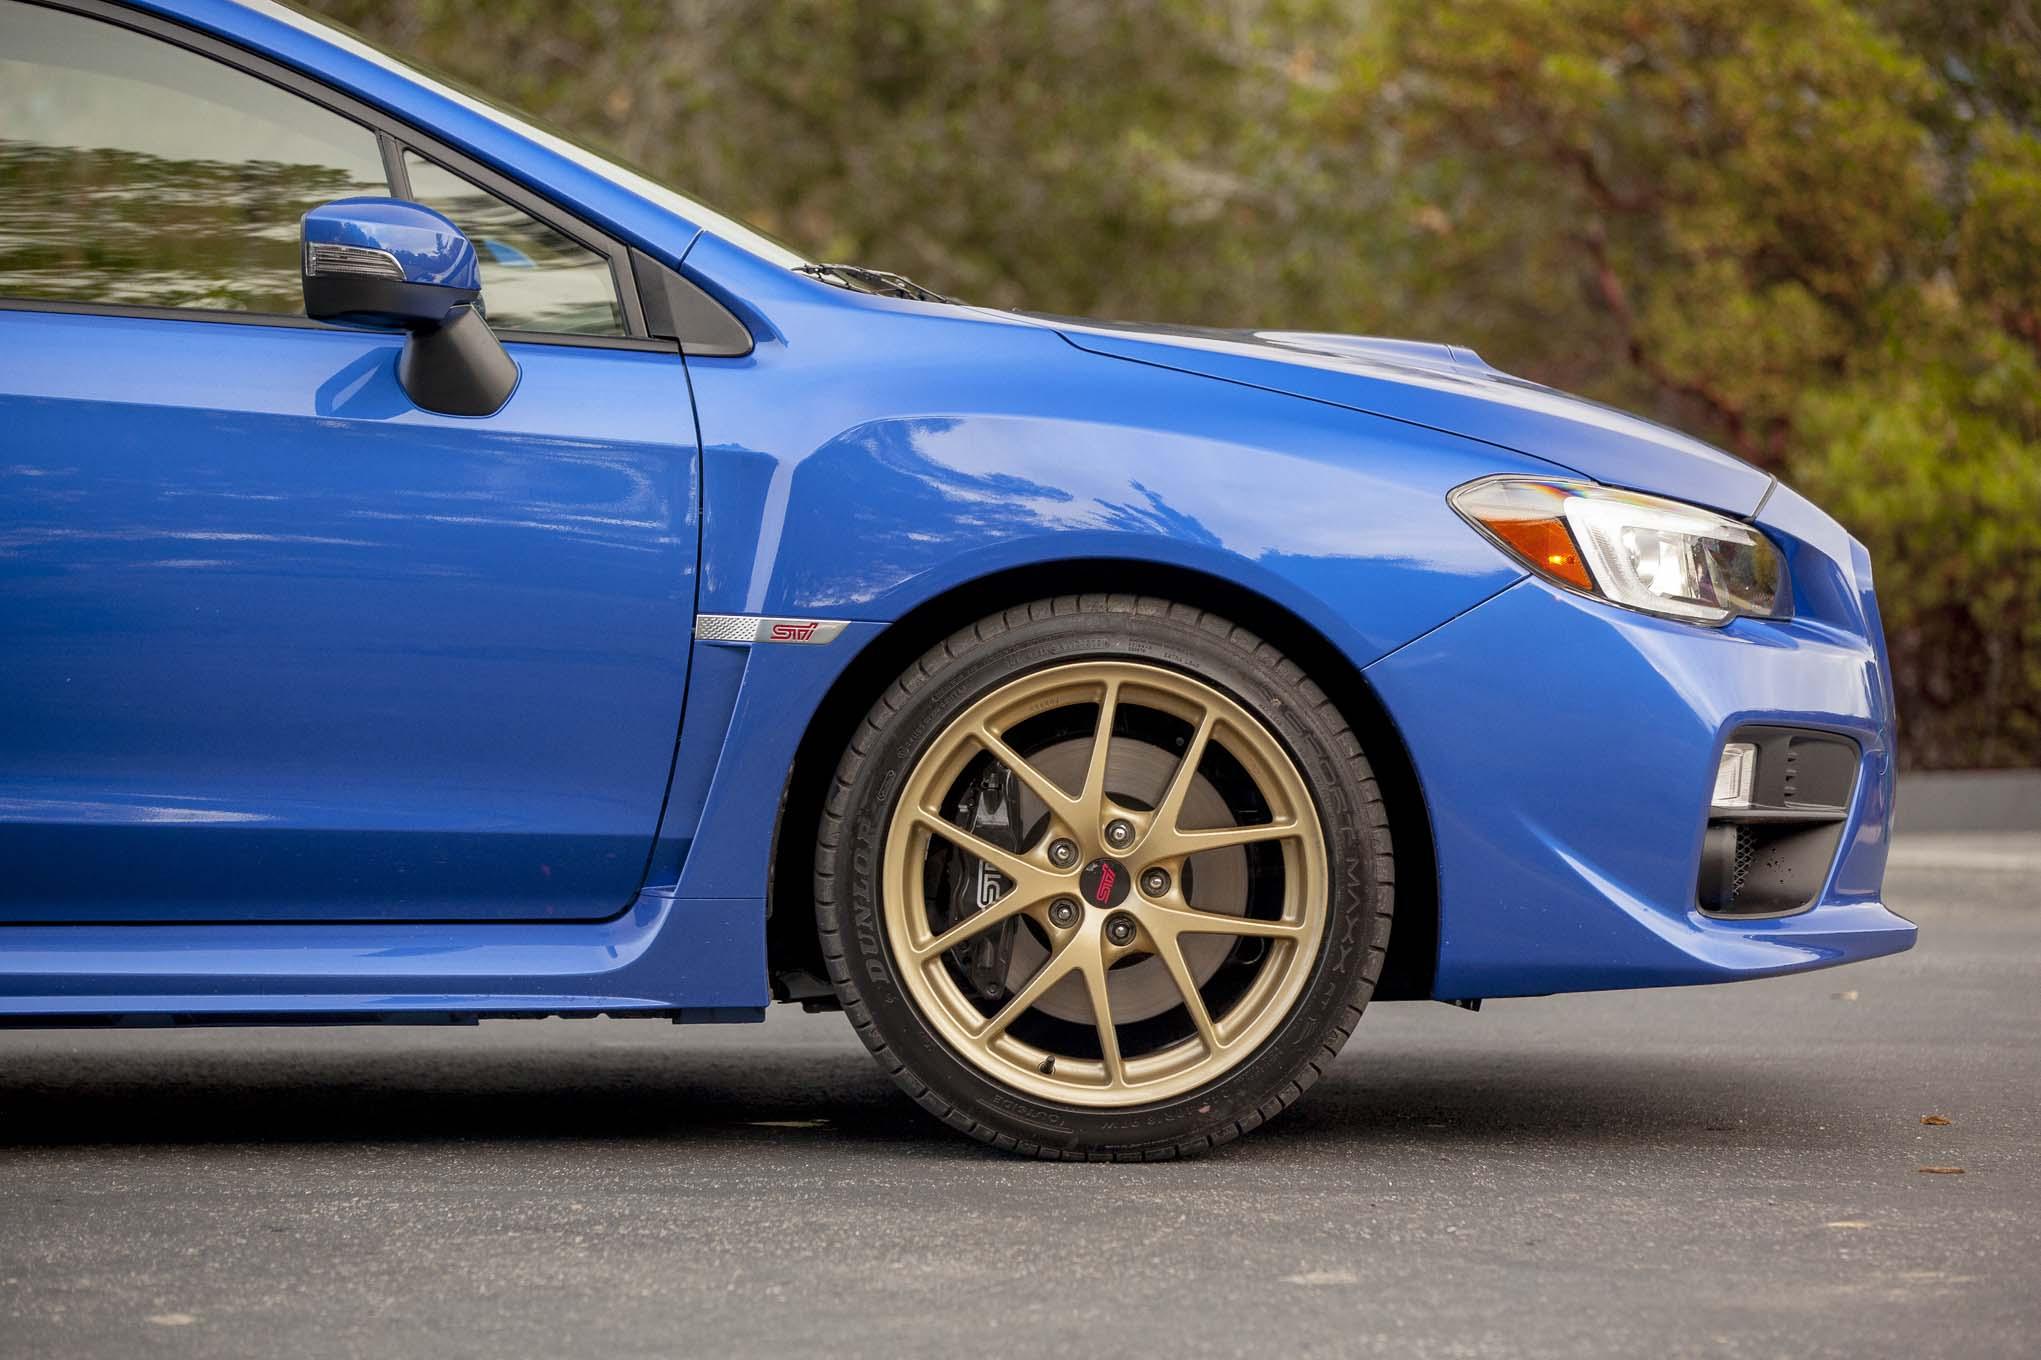 Subaru WRX WRX STI 2015 Automobile All Star